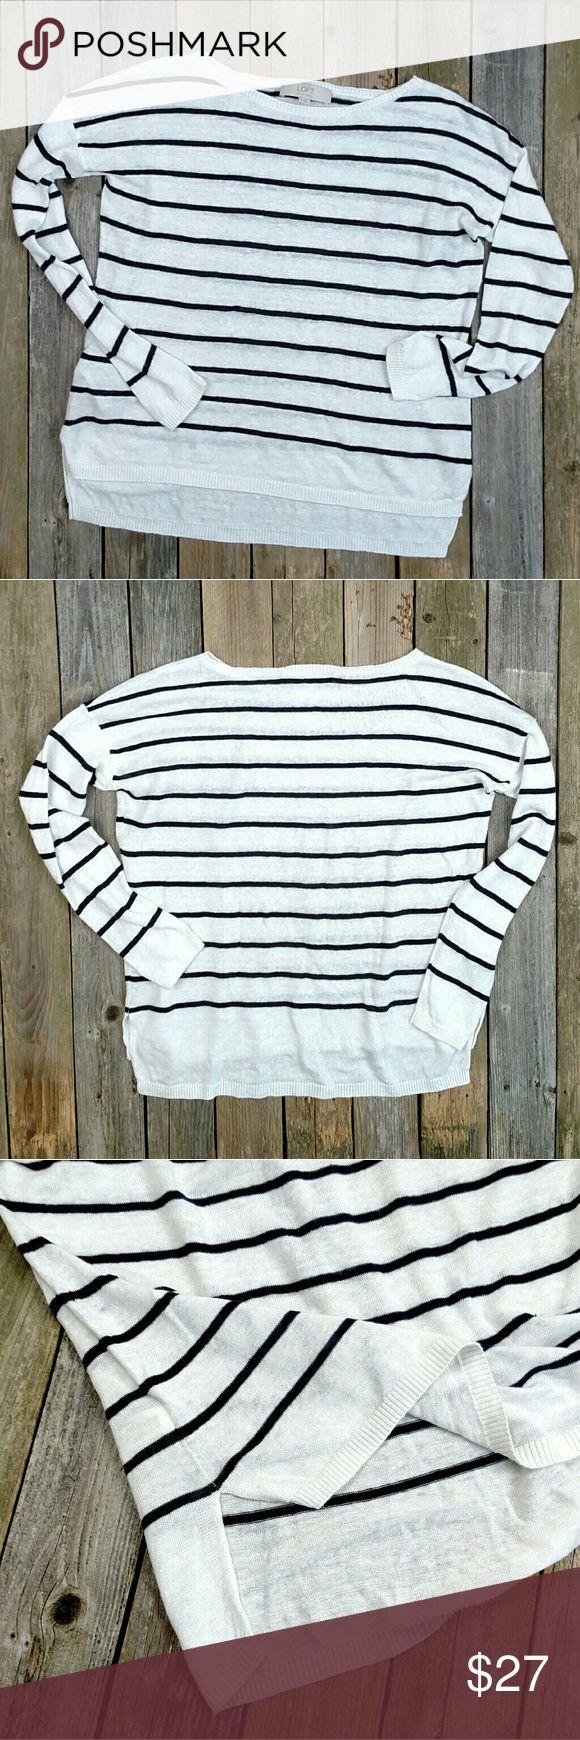 Selling this LOFT 100% Linen Open Weave Boatneck Pullover on Poshmark! My username is: shann12189. #shopmycloset #poshmark #fashion #shopping #style #forsale #LOFT #Tops